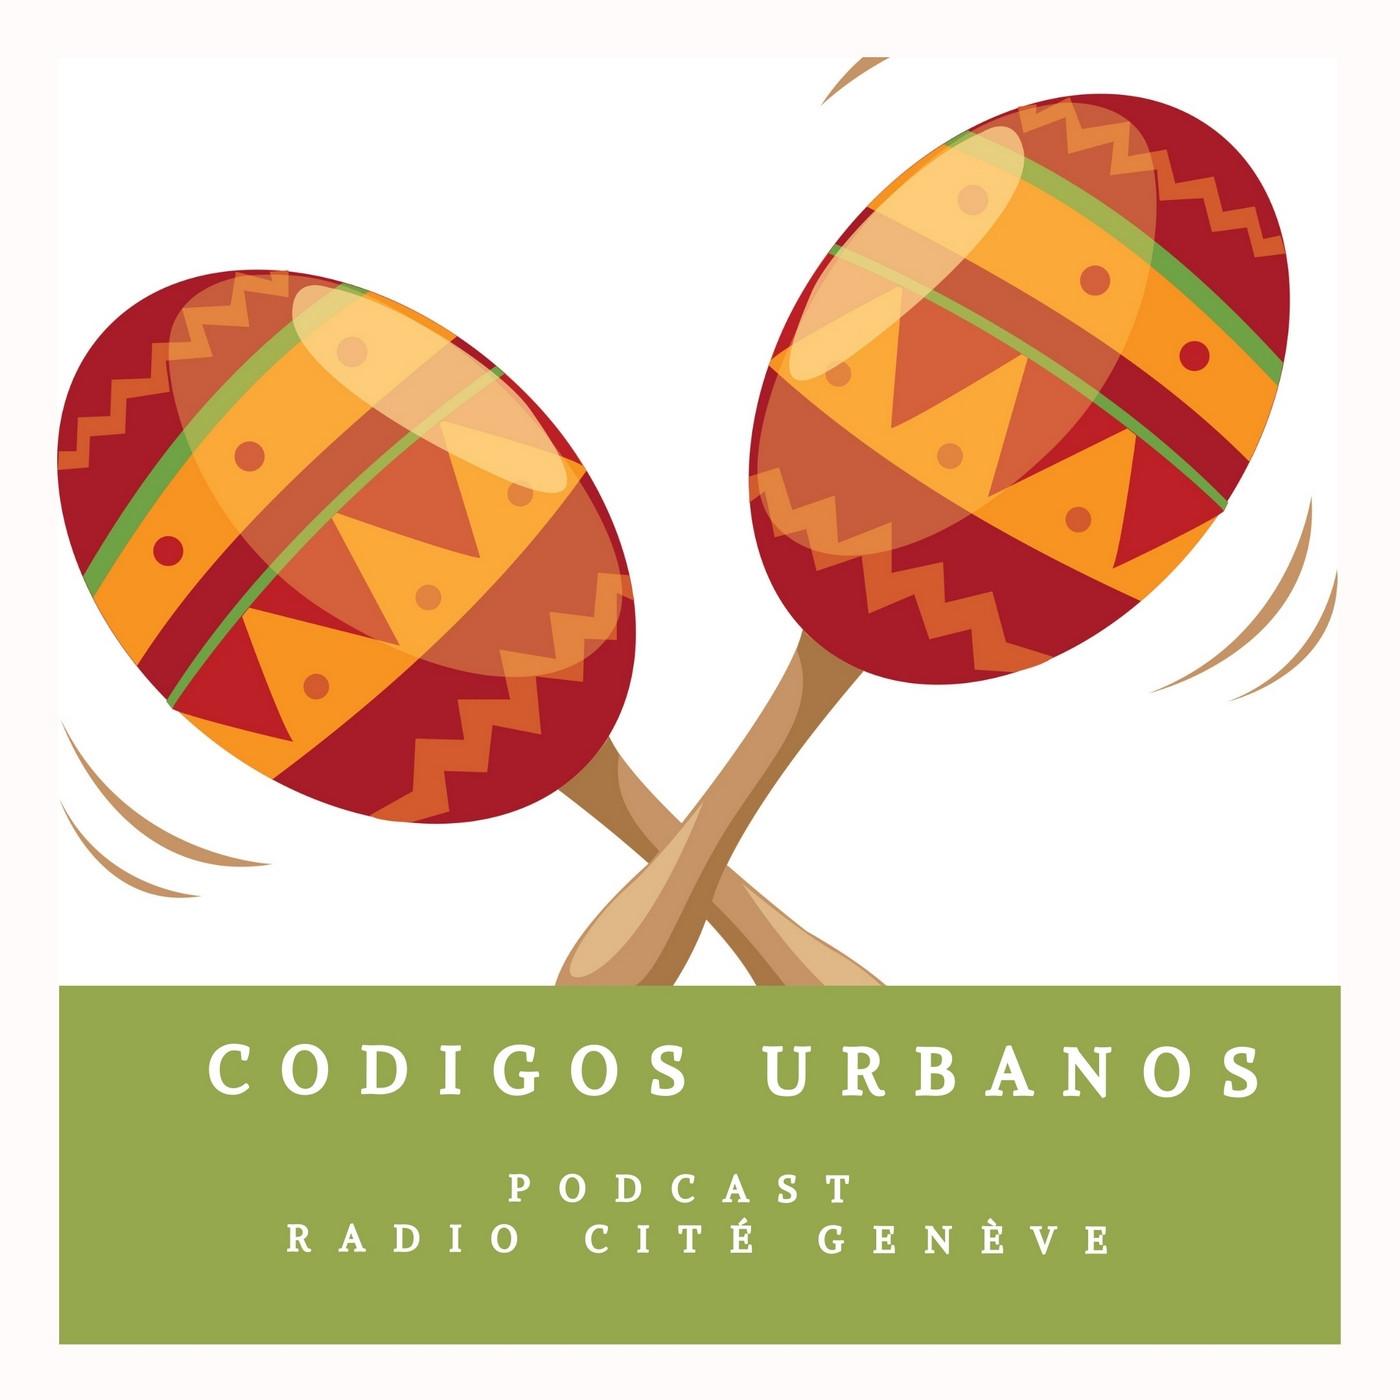 Codigos Urbanos - 01/12/20